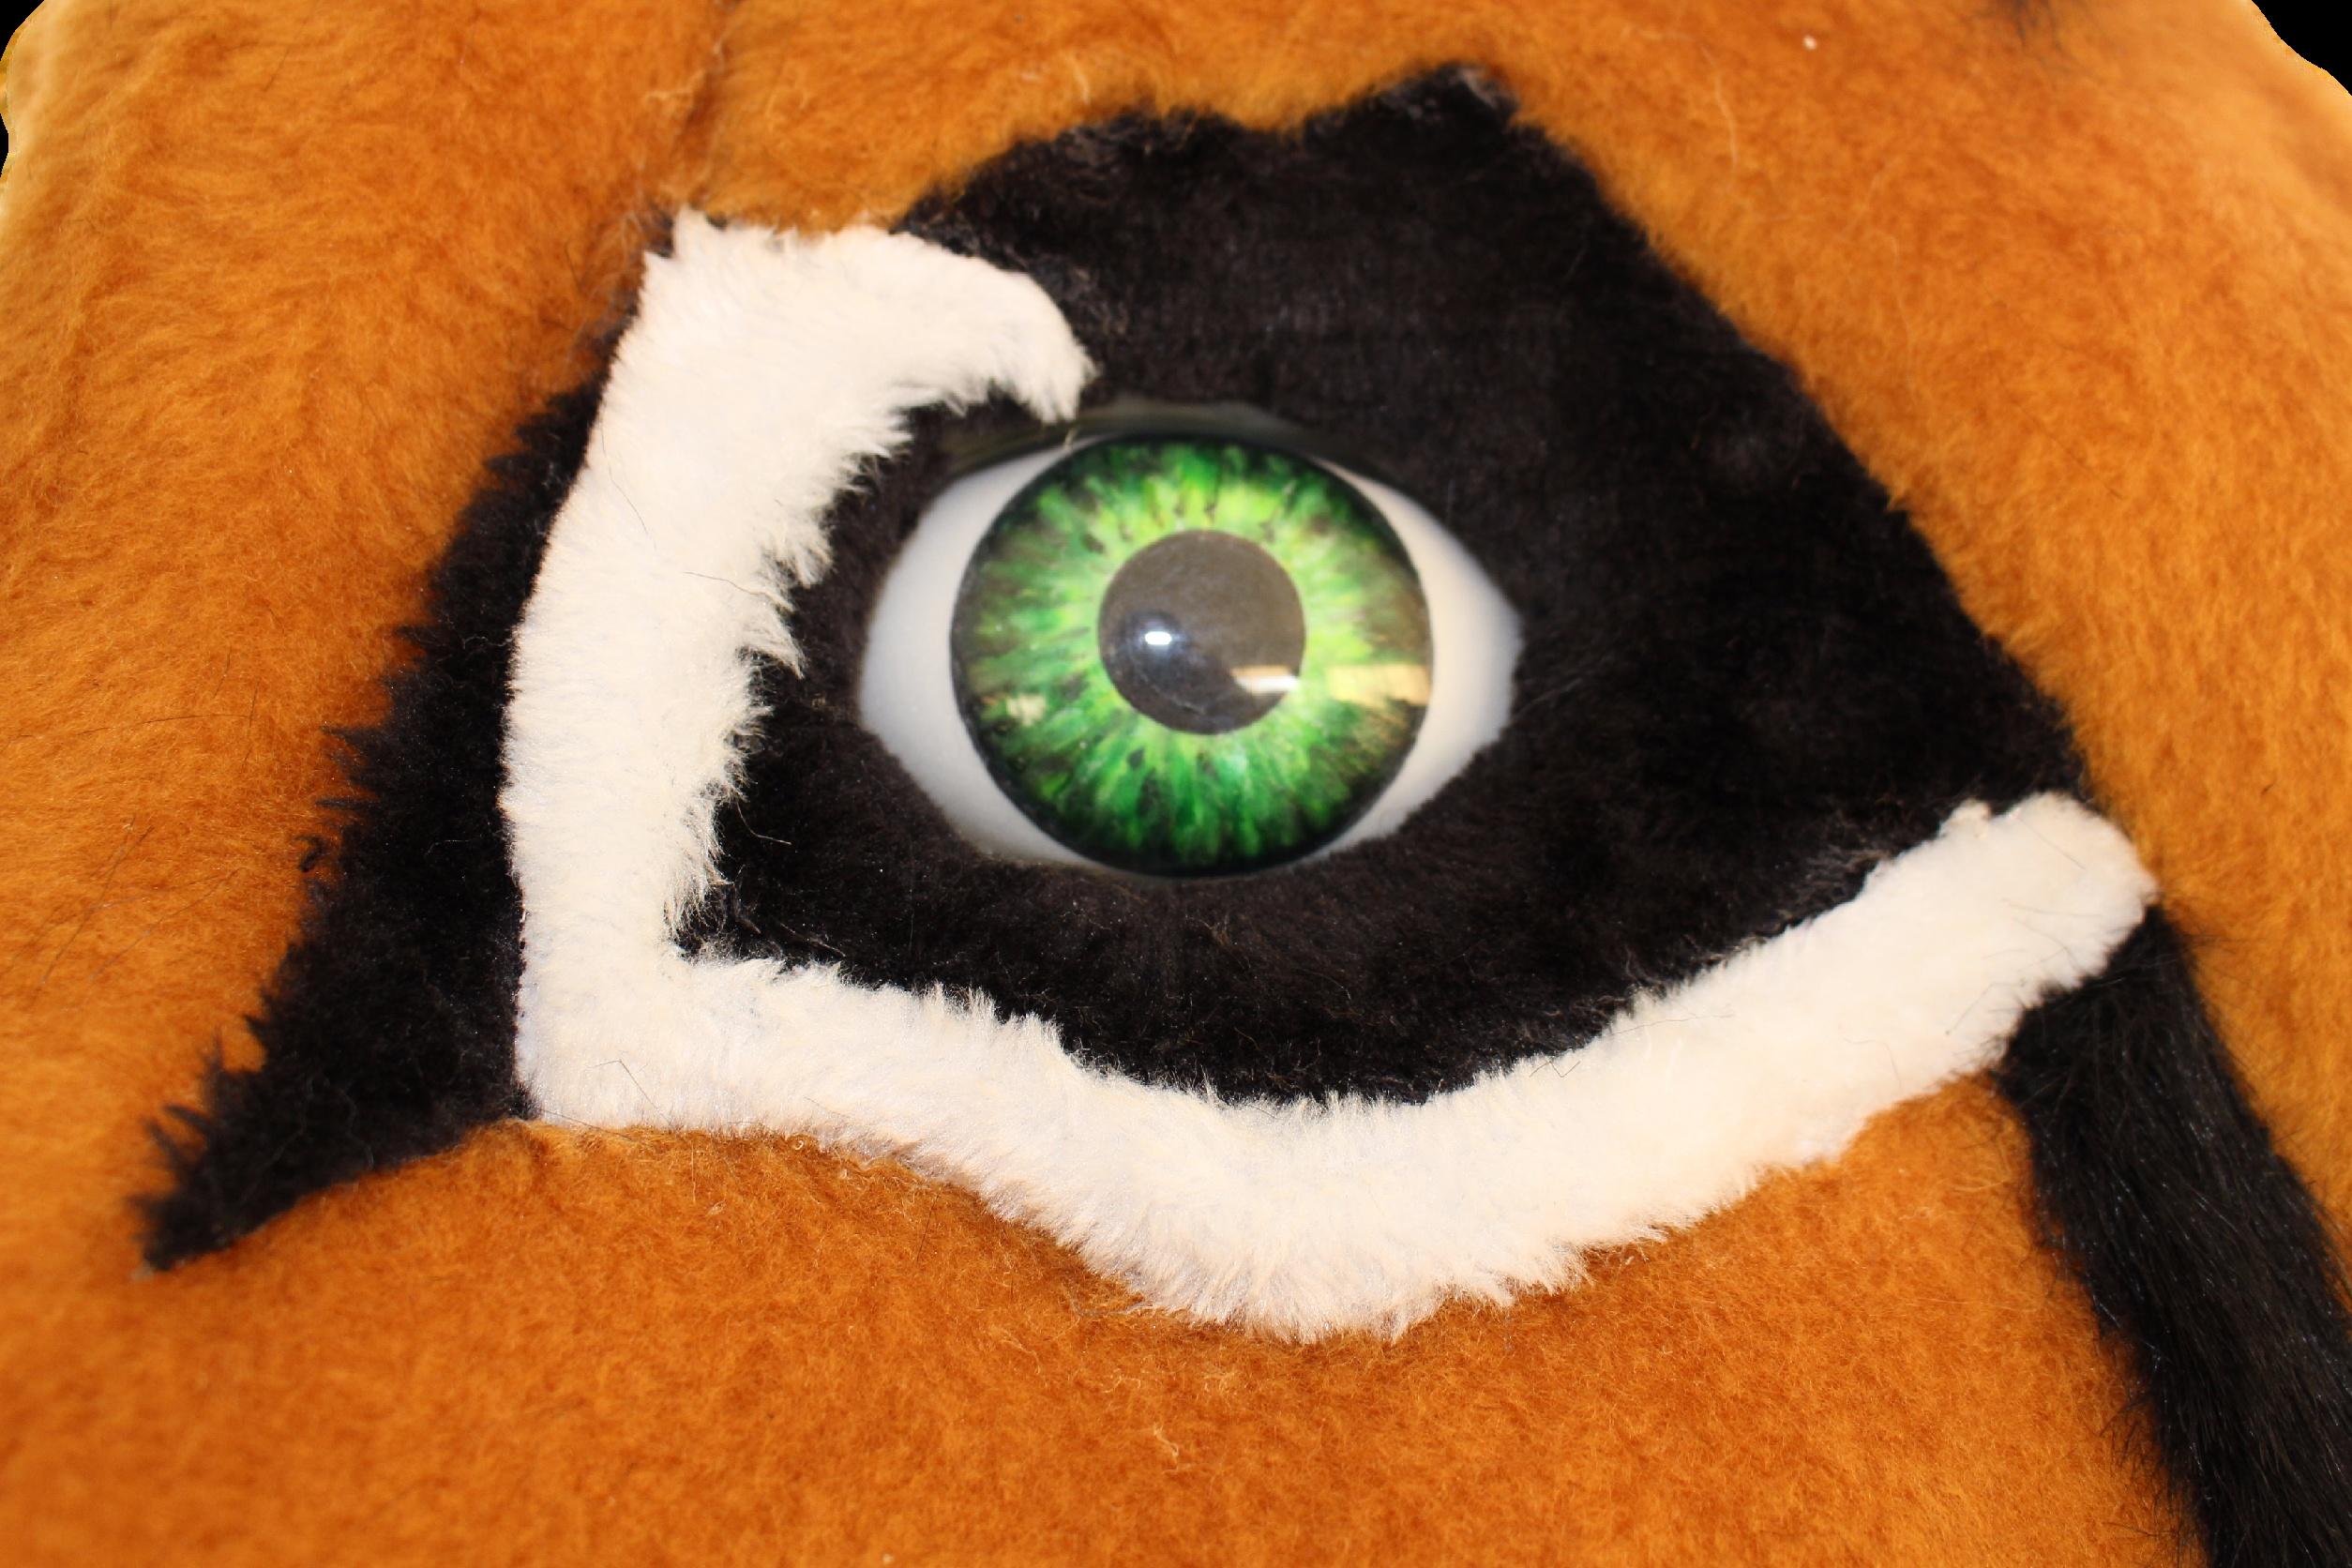 Mascote Partyval Lince - detalhe pintura olho